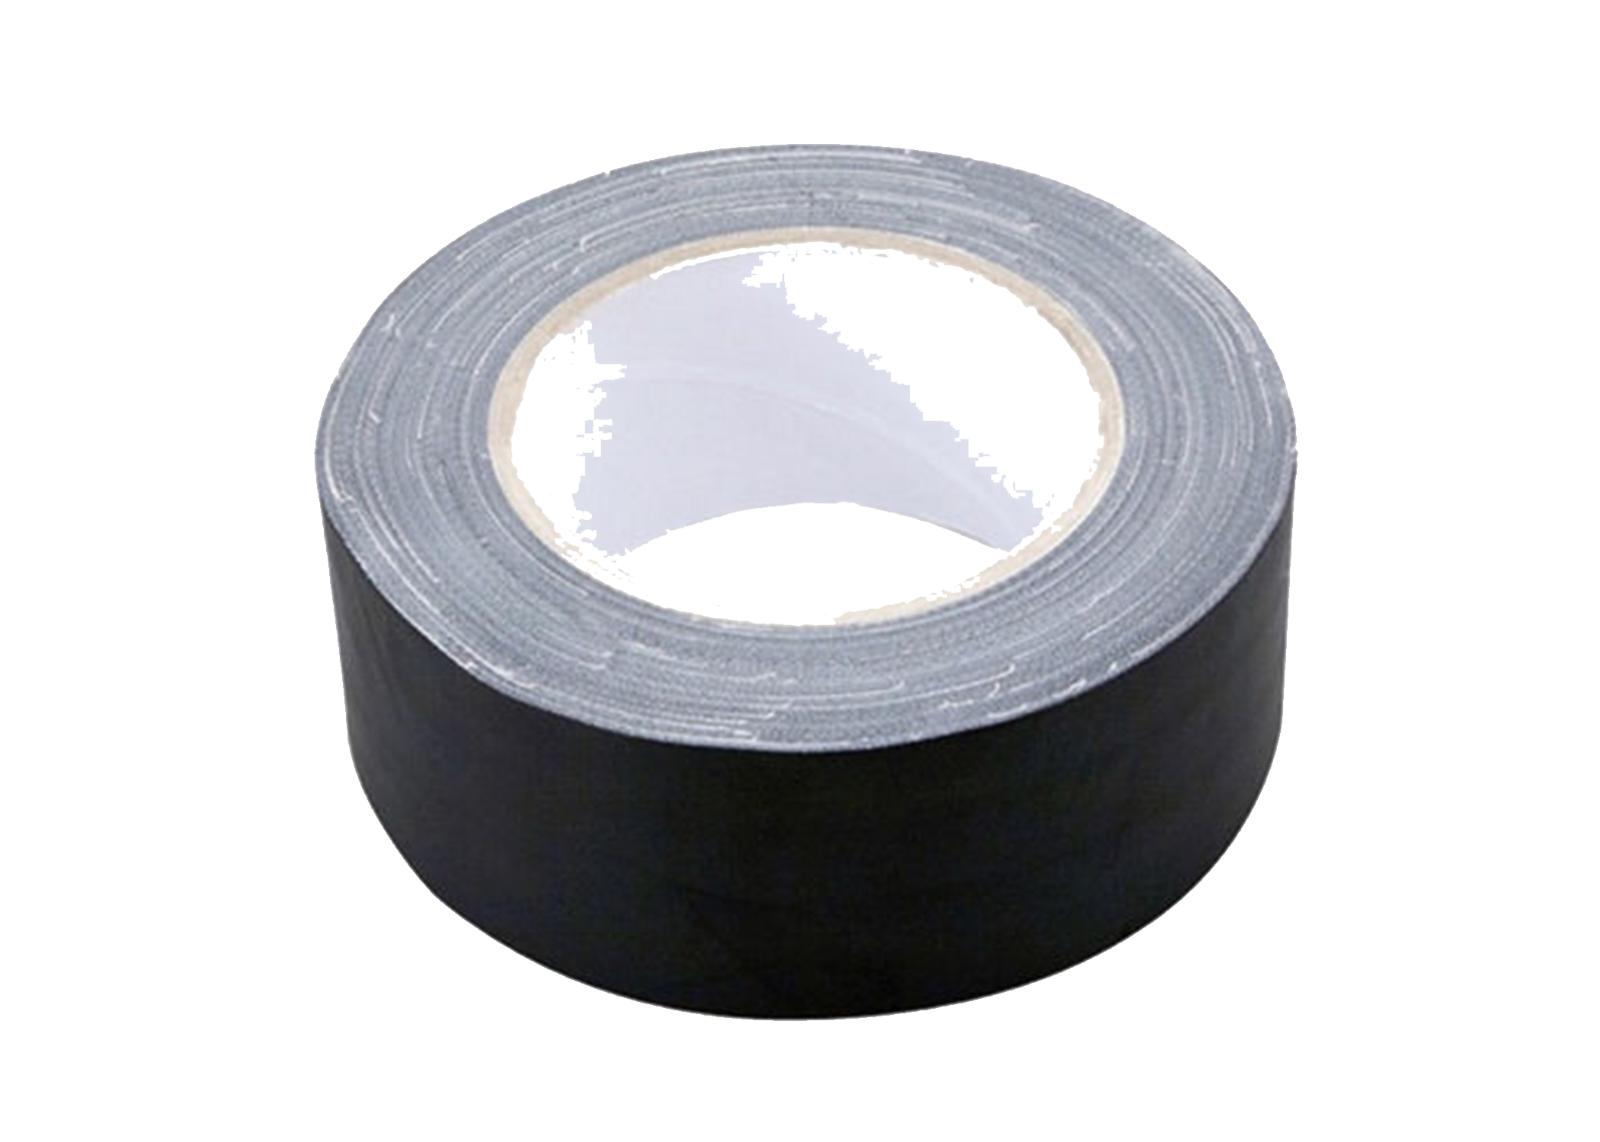 Hosa Technology GFT-526BK Black Gaffer Tape 30 Yards 2in. x 30yd